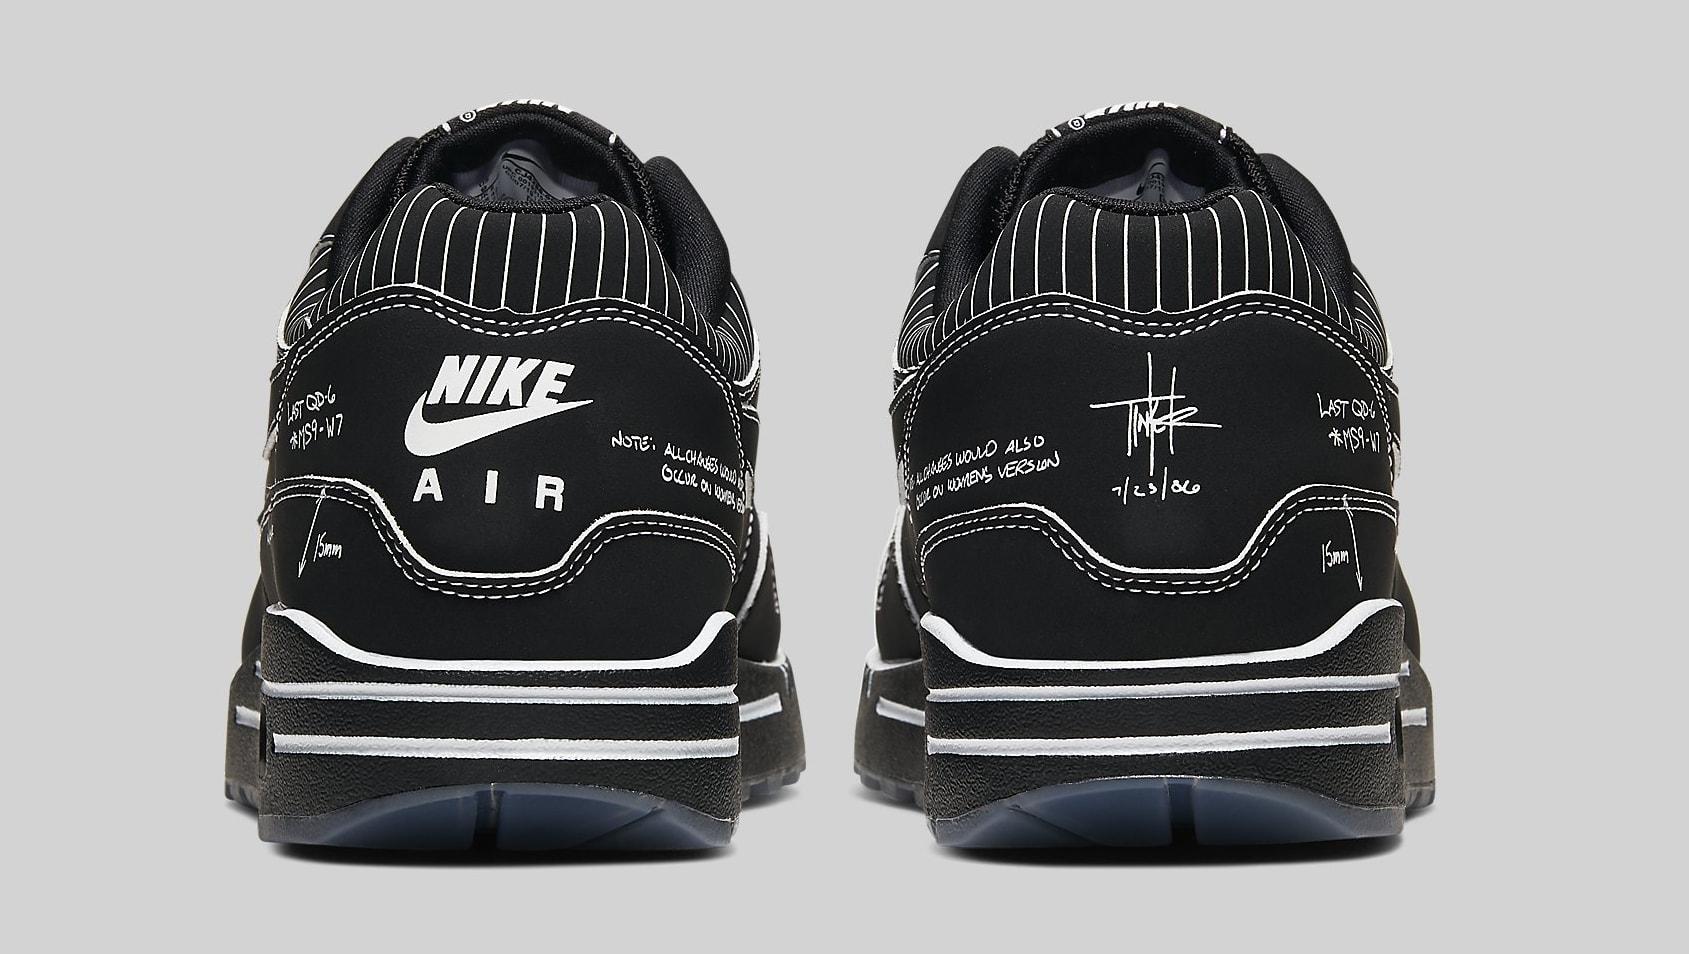 Nike Air Max 1 Black 'Schematic' CJ4286-001 Heel